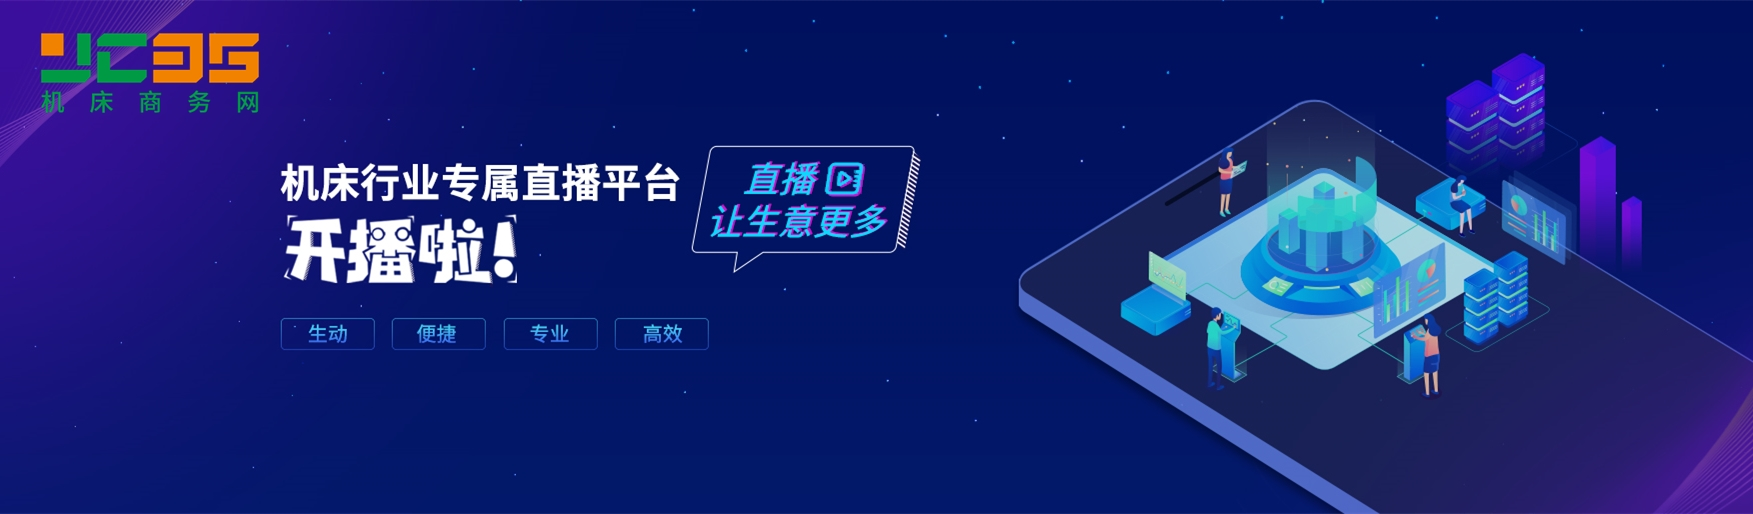 best365亚洲版官网商务网开启企业直播 让best365亚洲版官网生意不再难做